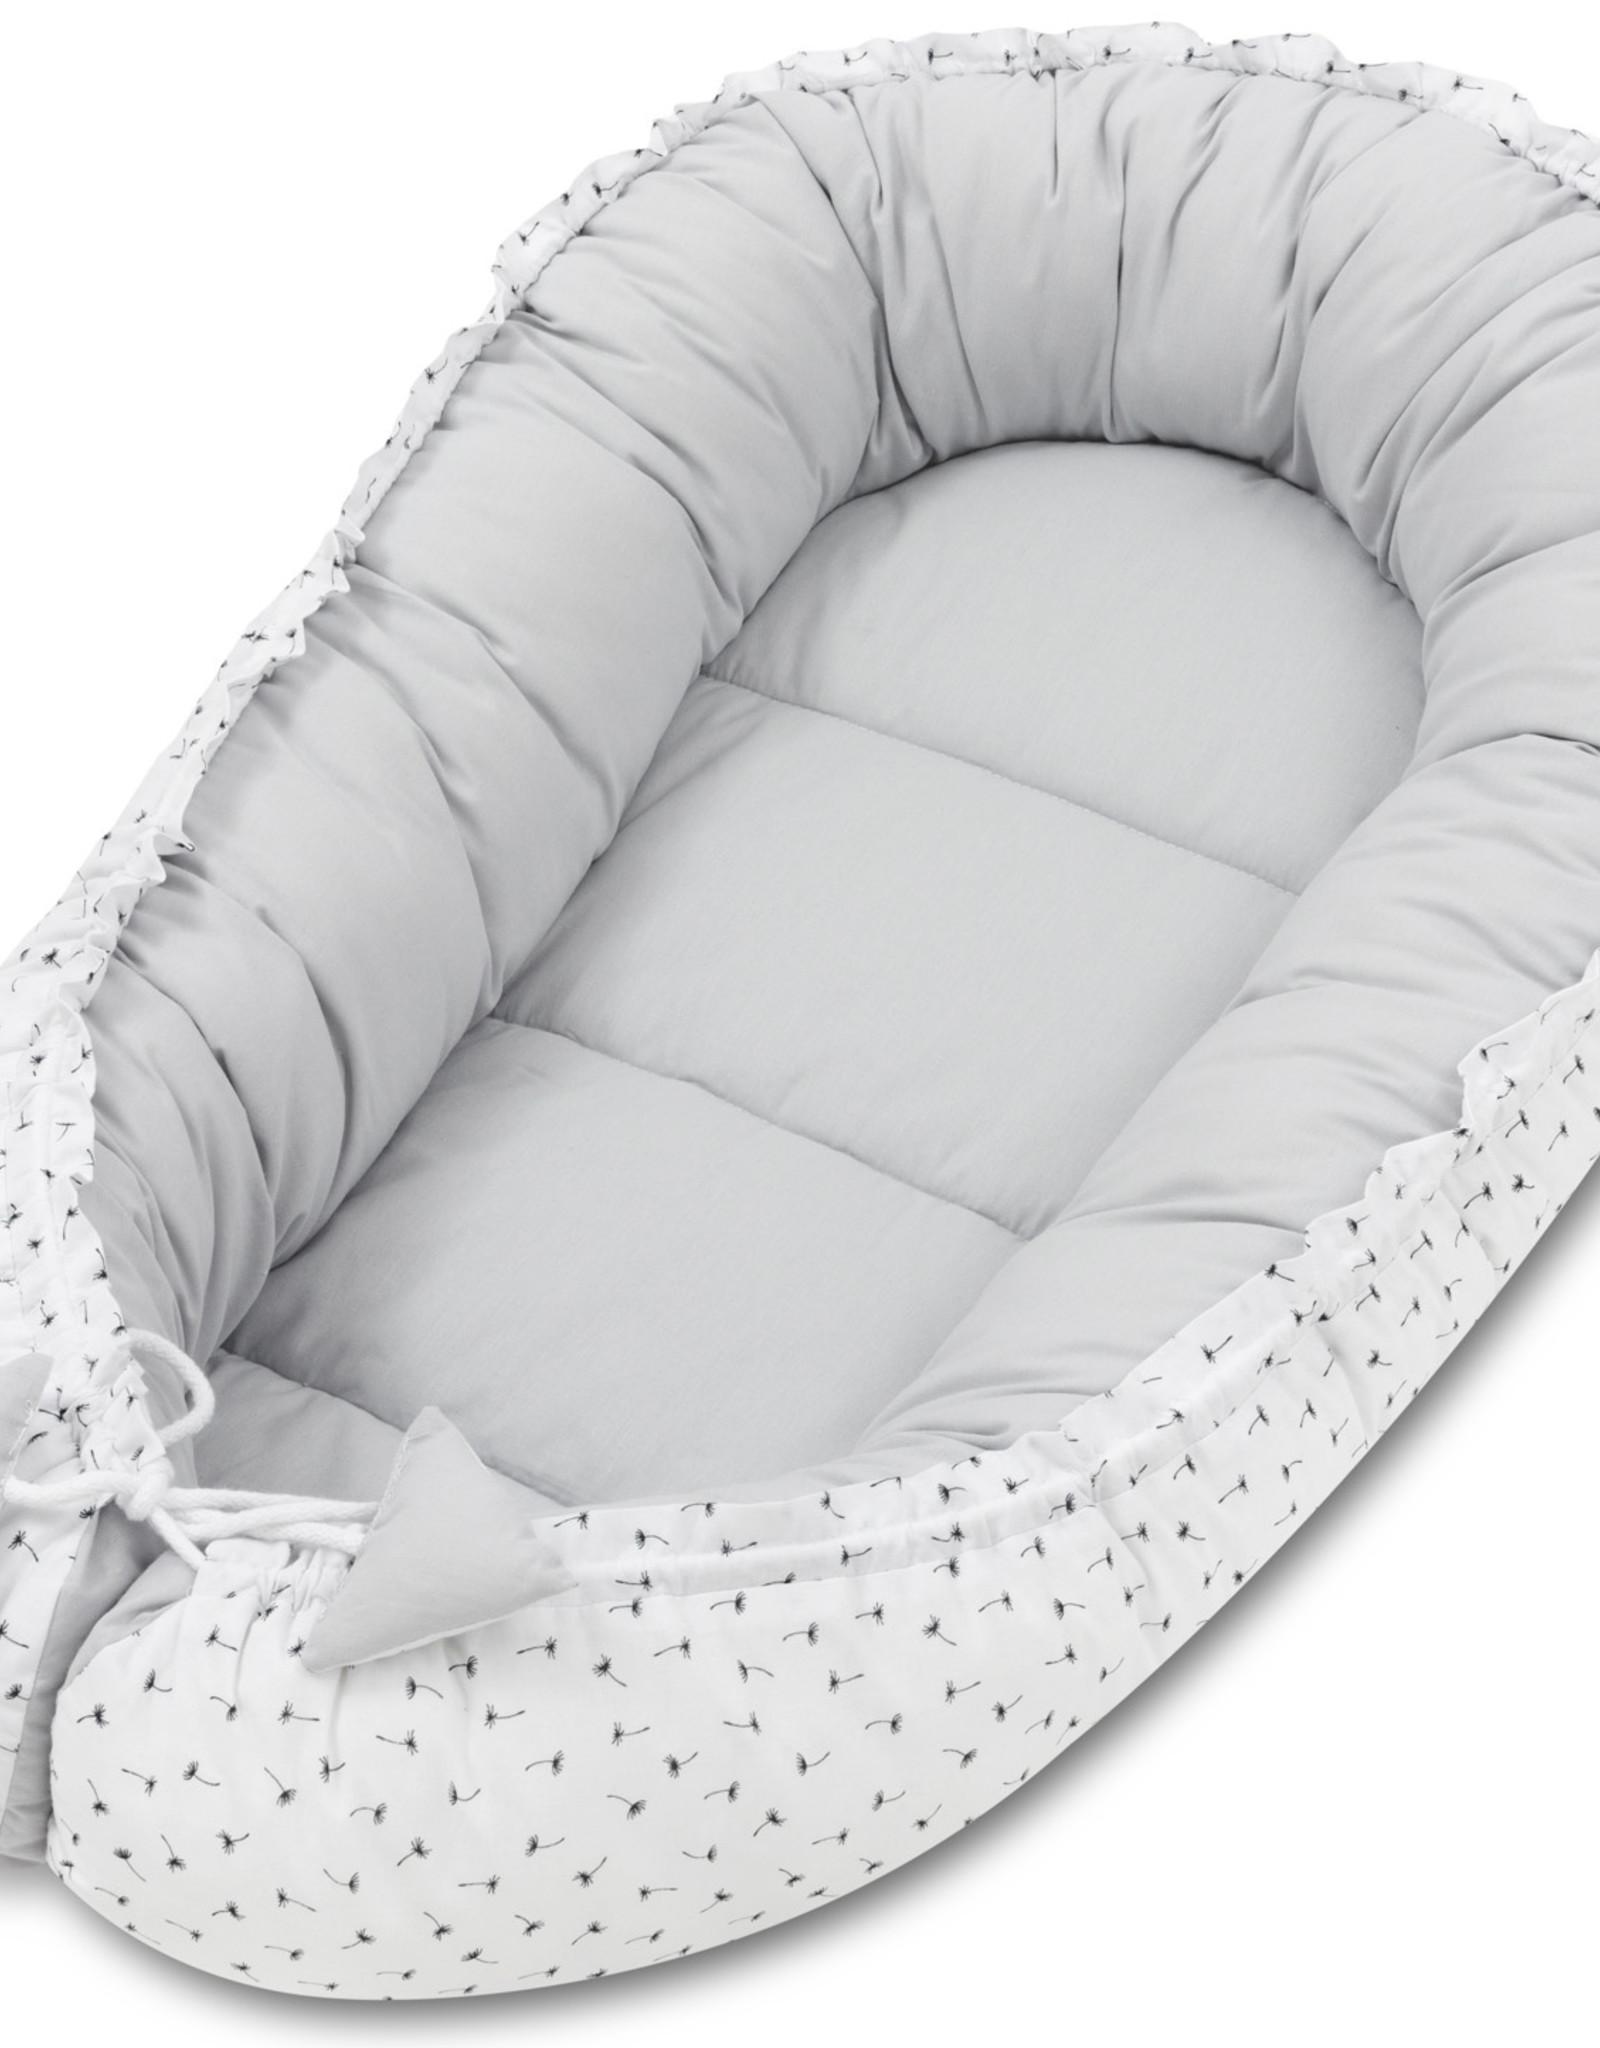 Baby nest set  - Indian summer